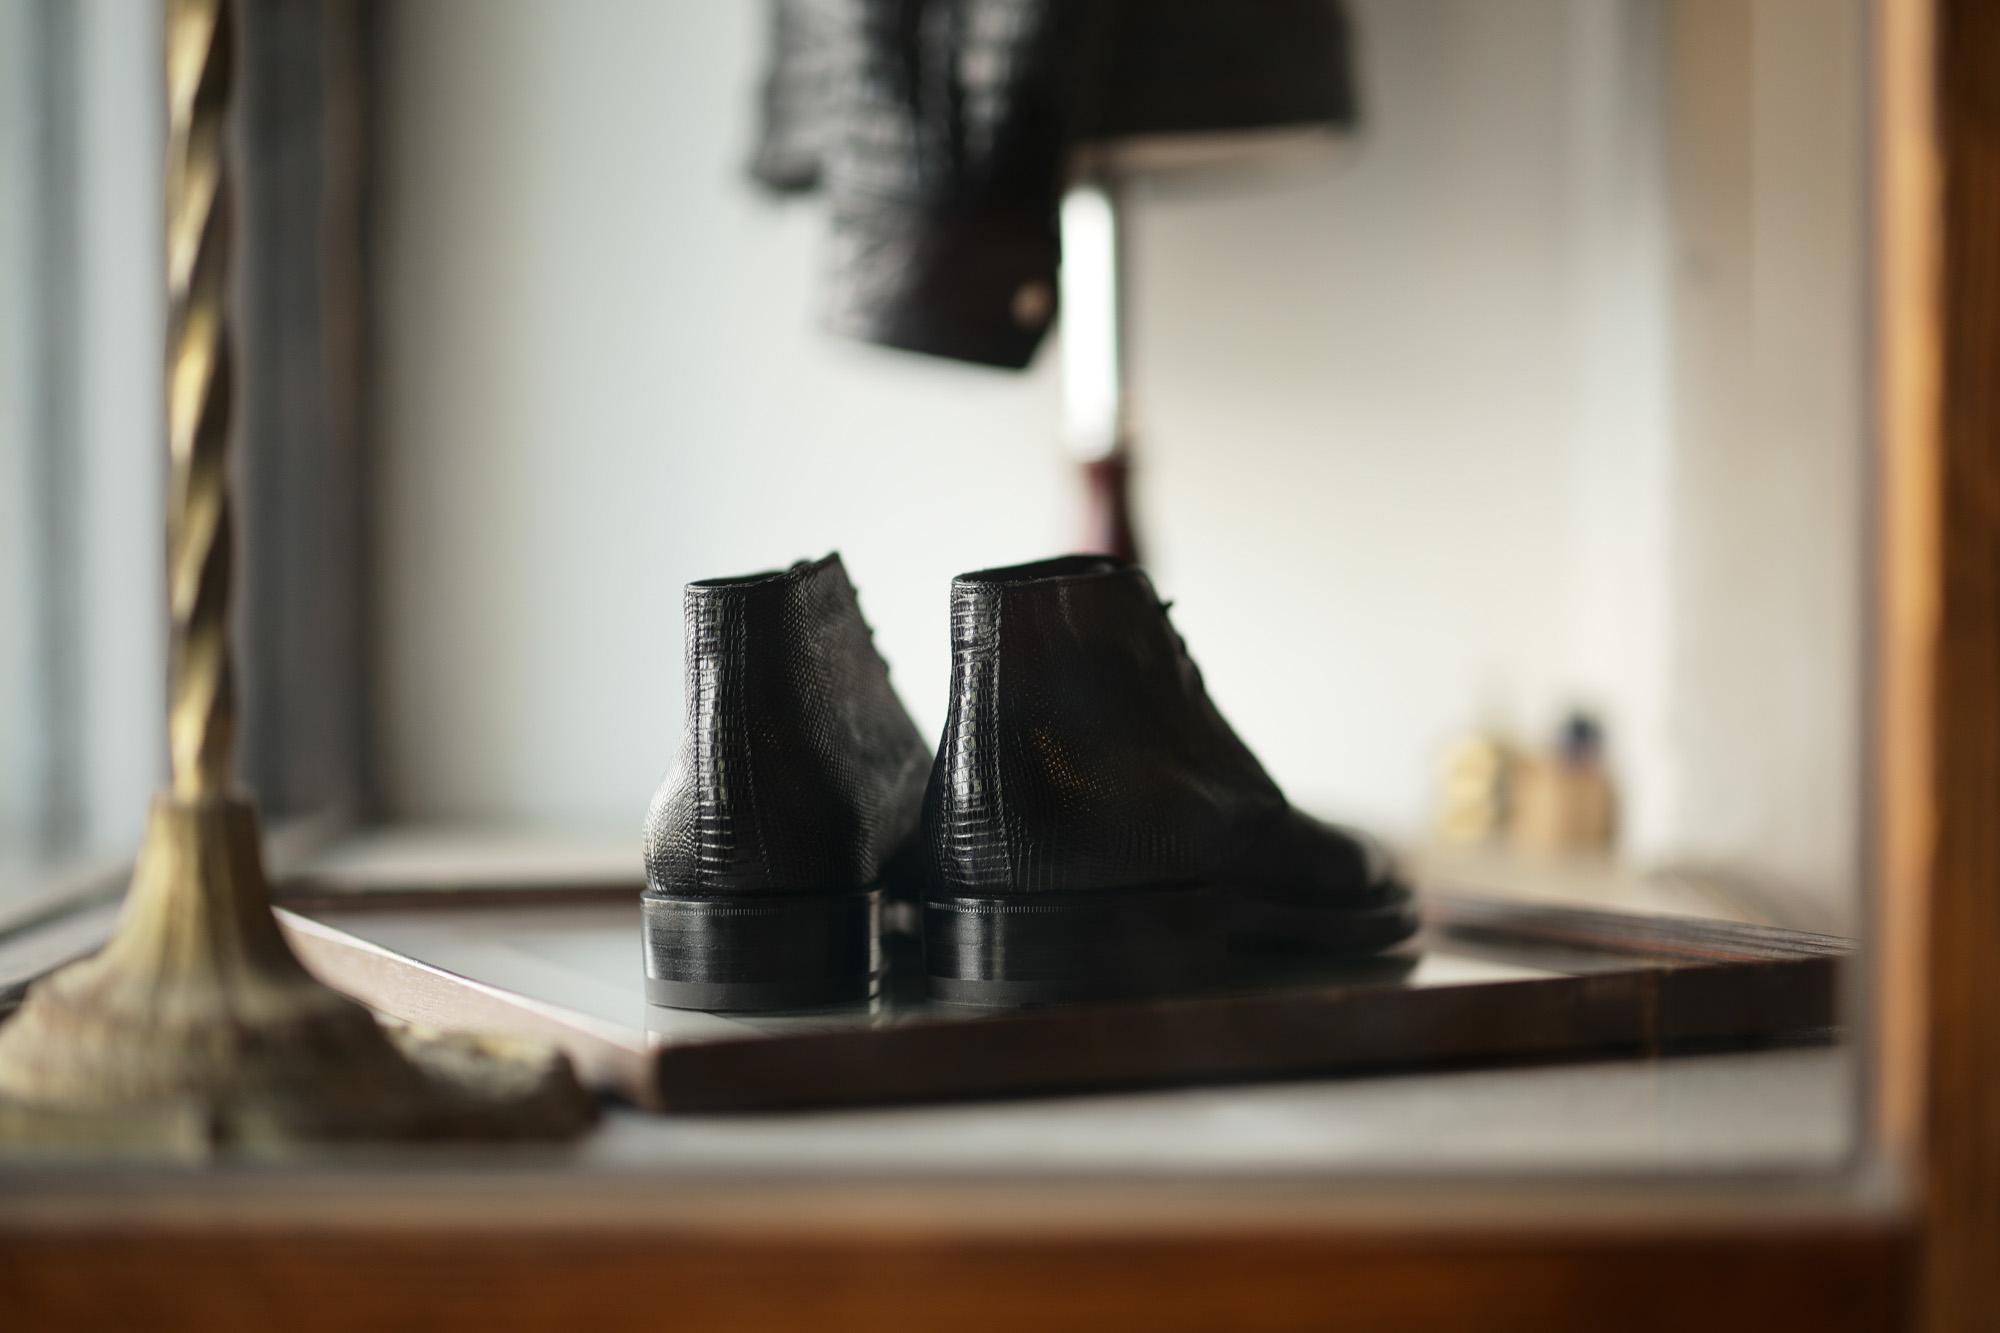 ENZO BONAFE (エンツォボナフェ) ART.3722 Chukka boots Lizard Leather リザード エキゾチックレザー チャッカブーツ NERO (ブラック) made in italy (イタリア製) 2021 【Special Model】愛知 名古屋 Alto e Diritto altoediritto アルトエデリット